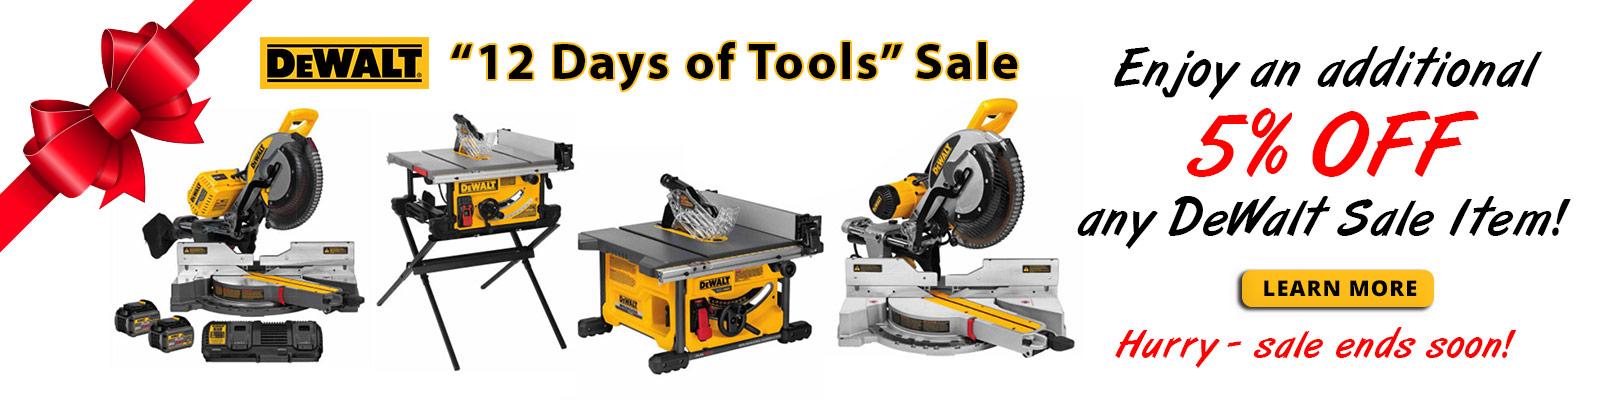 DeWalt Tool Sale